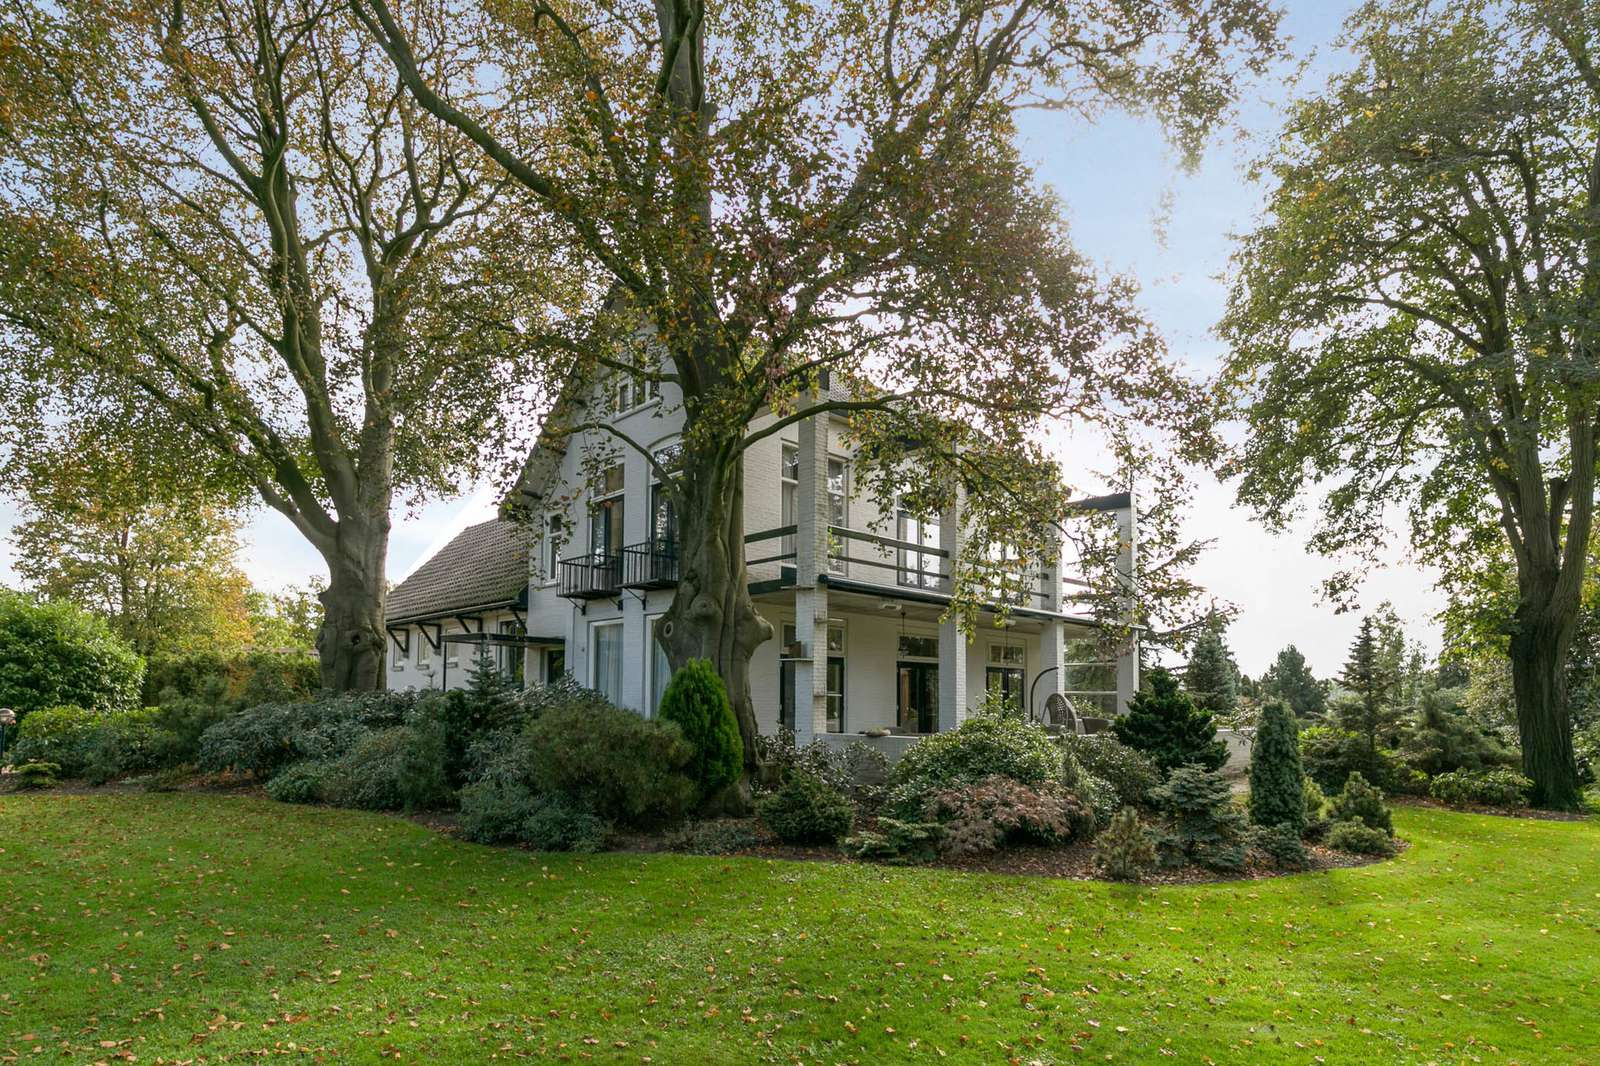 Theerestraat 111, villa Sint-Michielsgestel